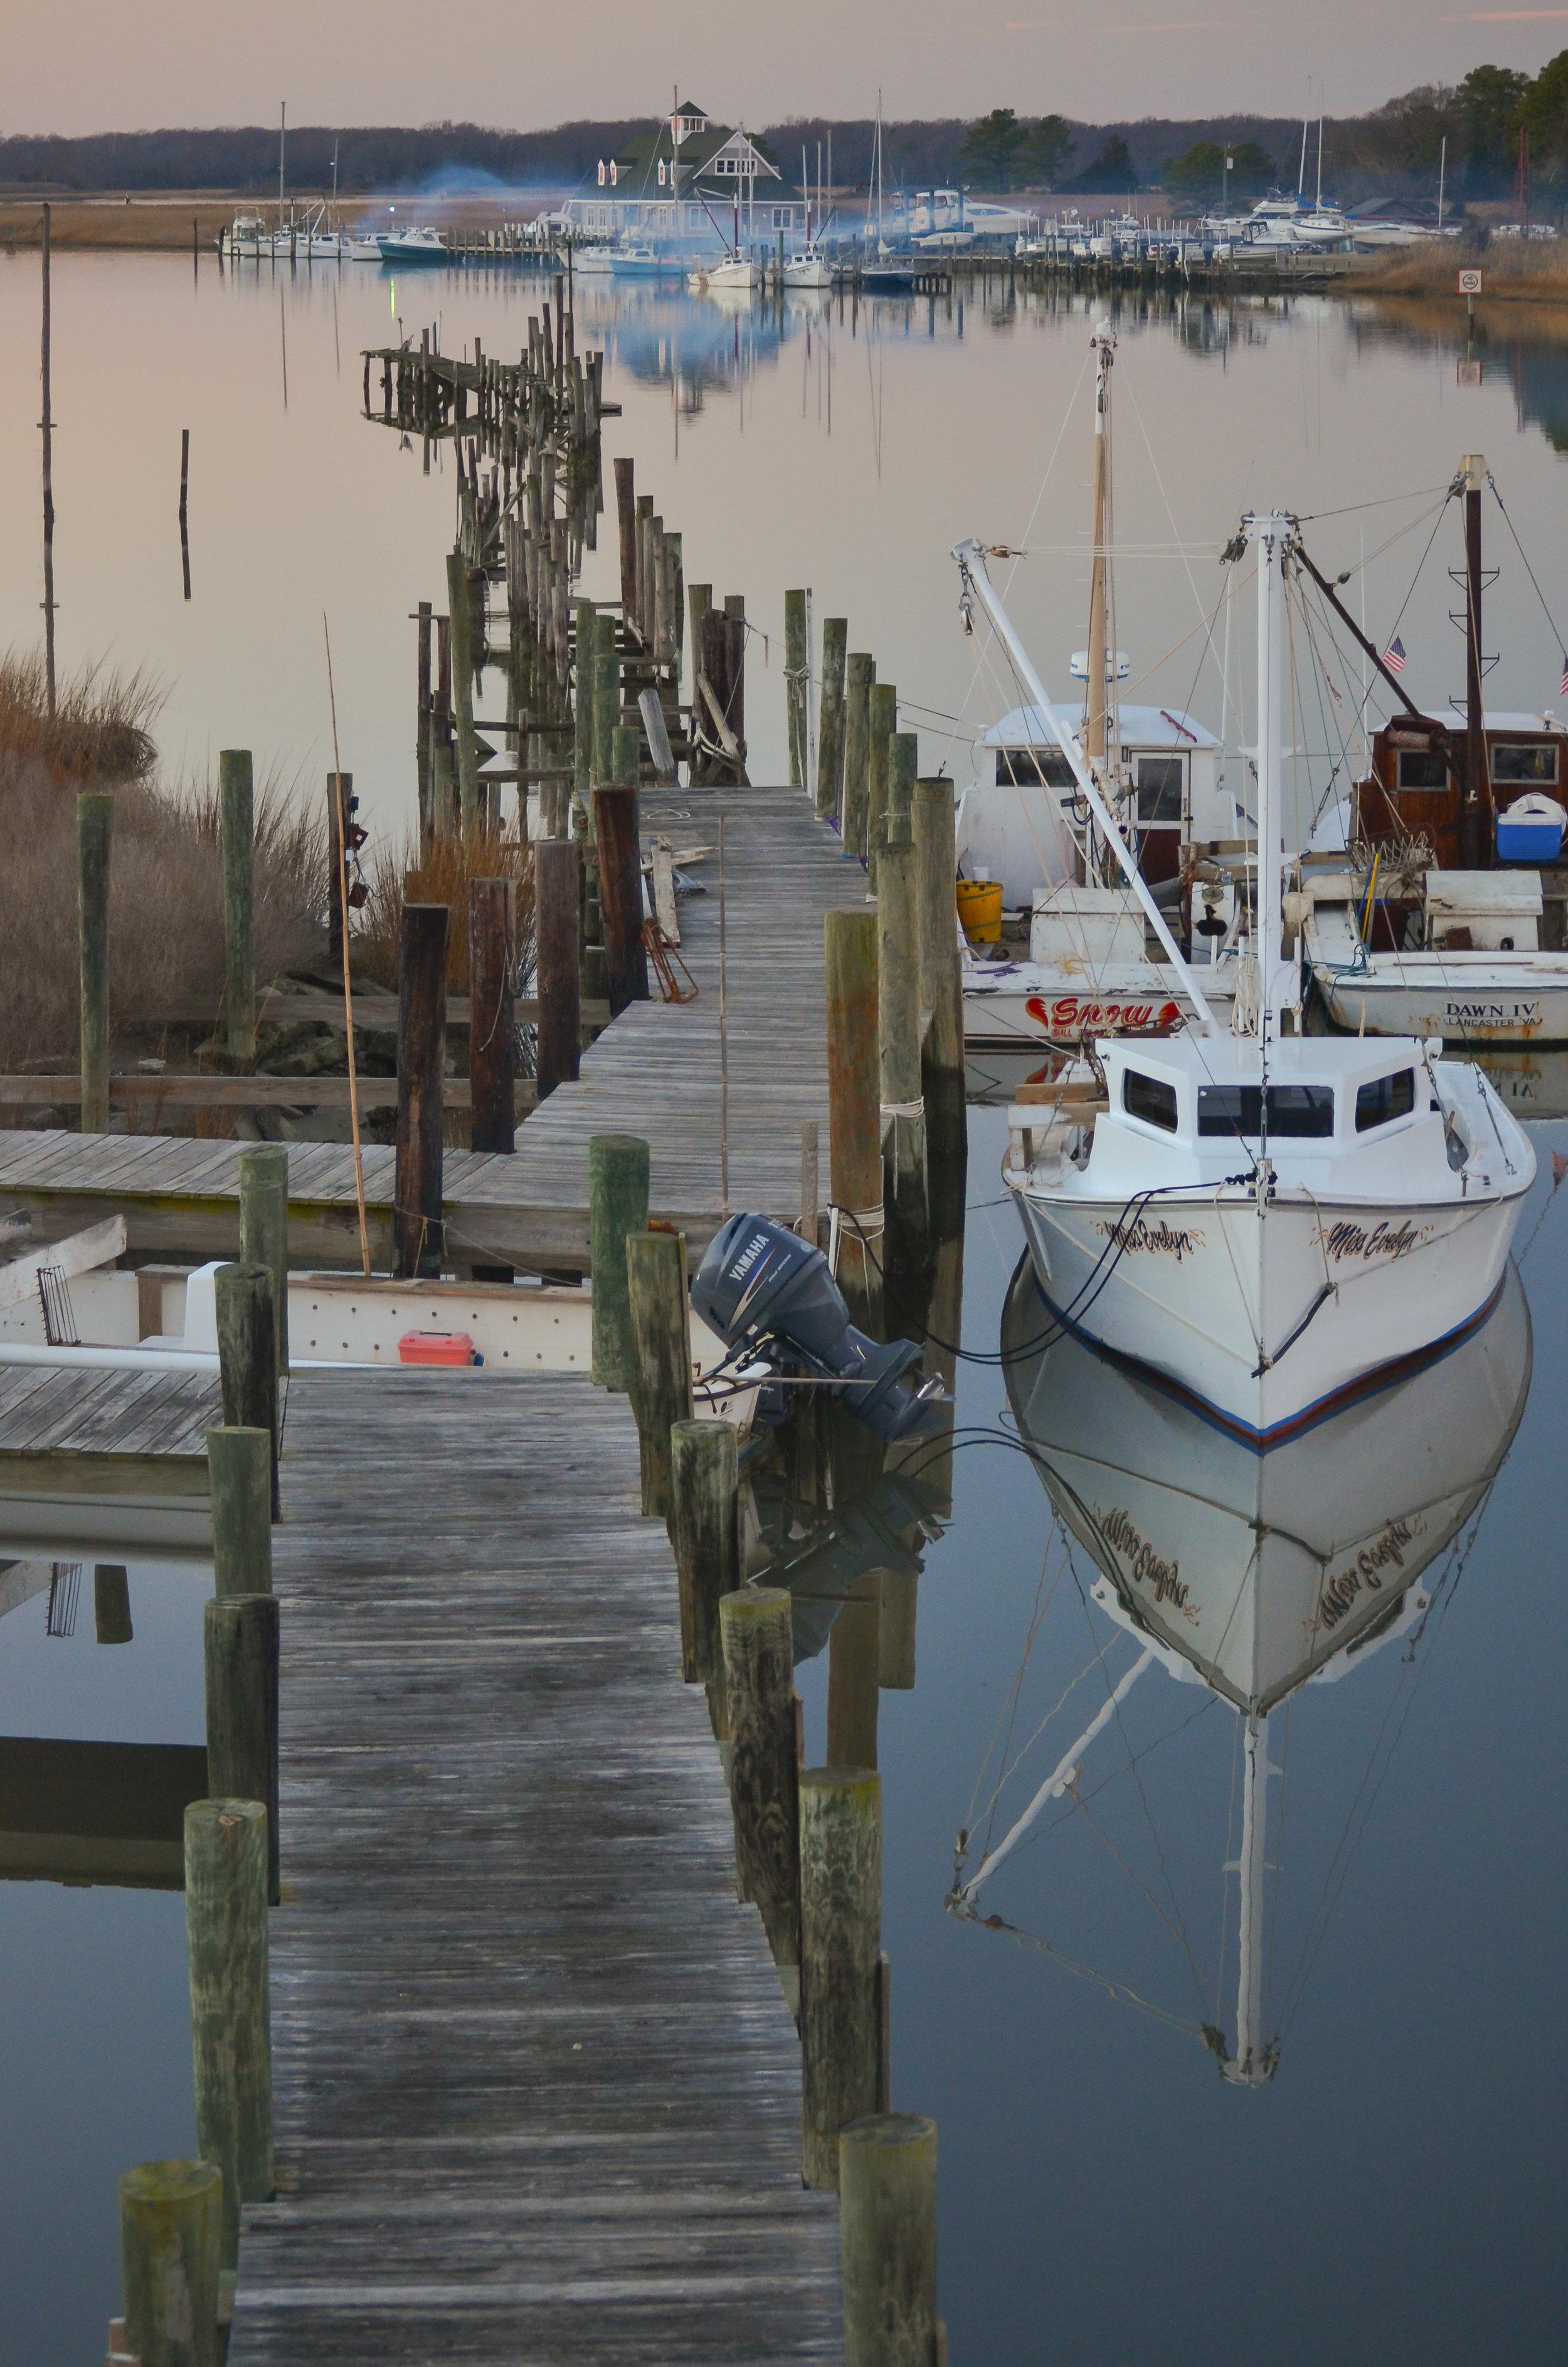 dock-fishing boats-boats-reflection-Isle of Wight County-Virginia.jpg